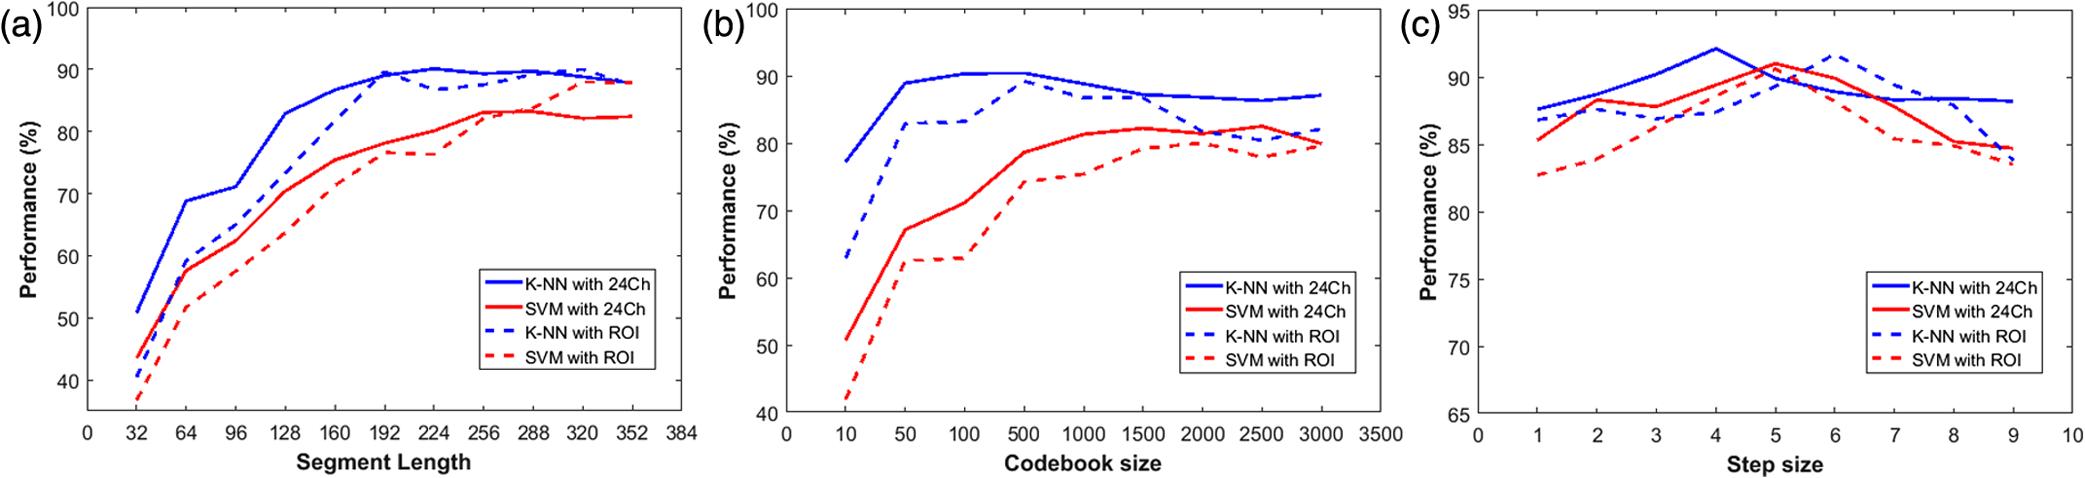 Toward a functional near-infrared spectroscopy-based